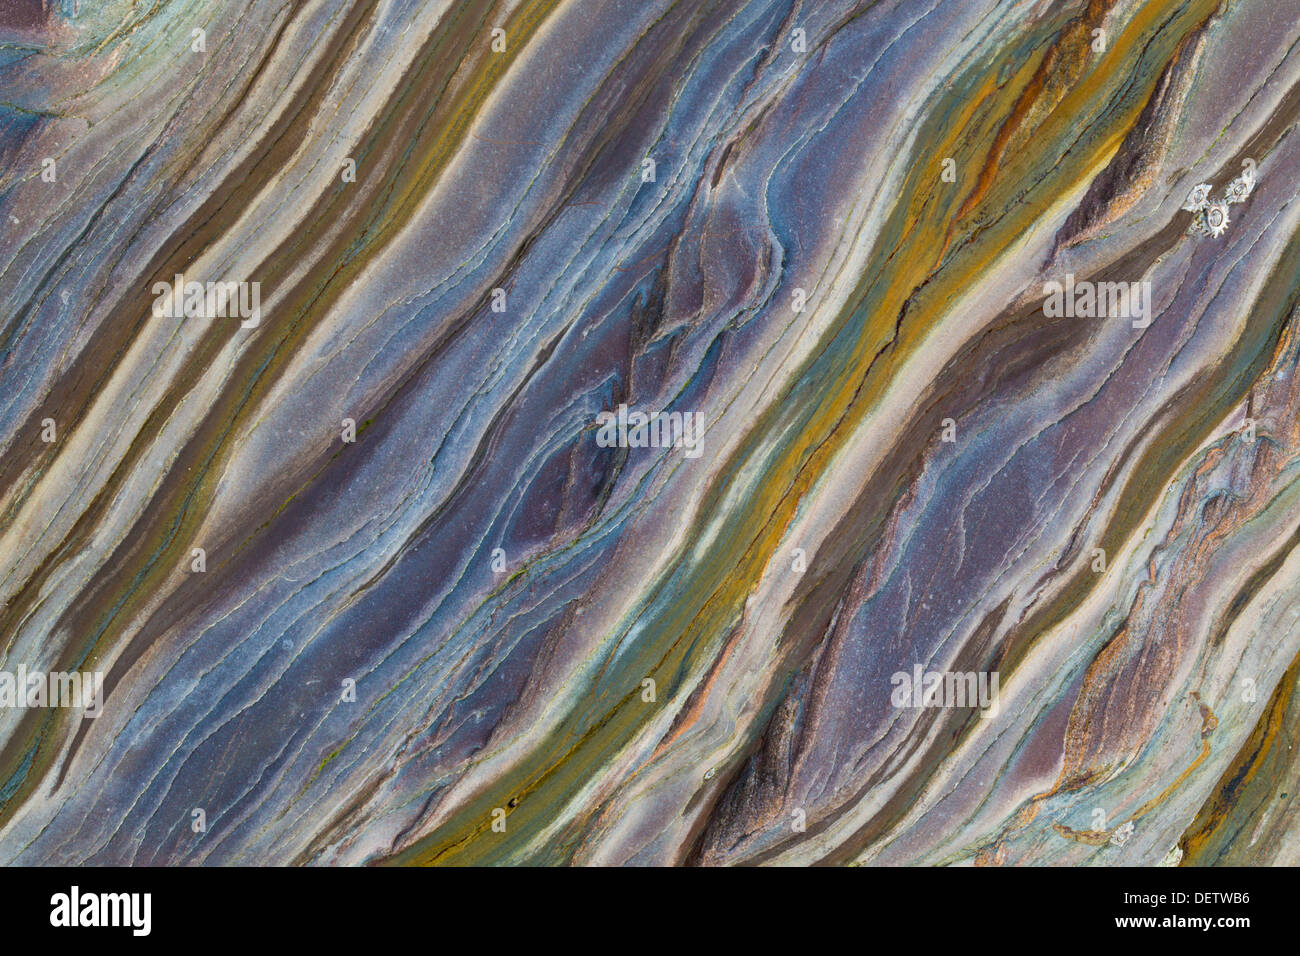 Les modèles d'Ardoise; géologie; Polzeath, Cornwall, UK Photo Stock